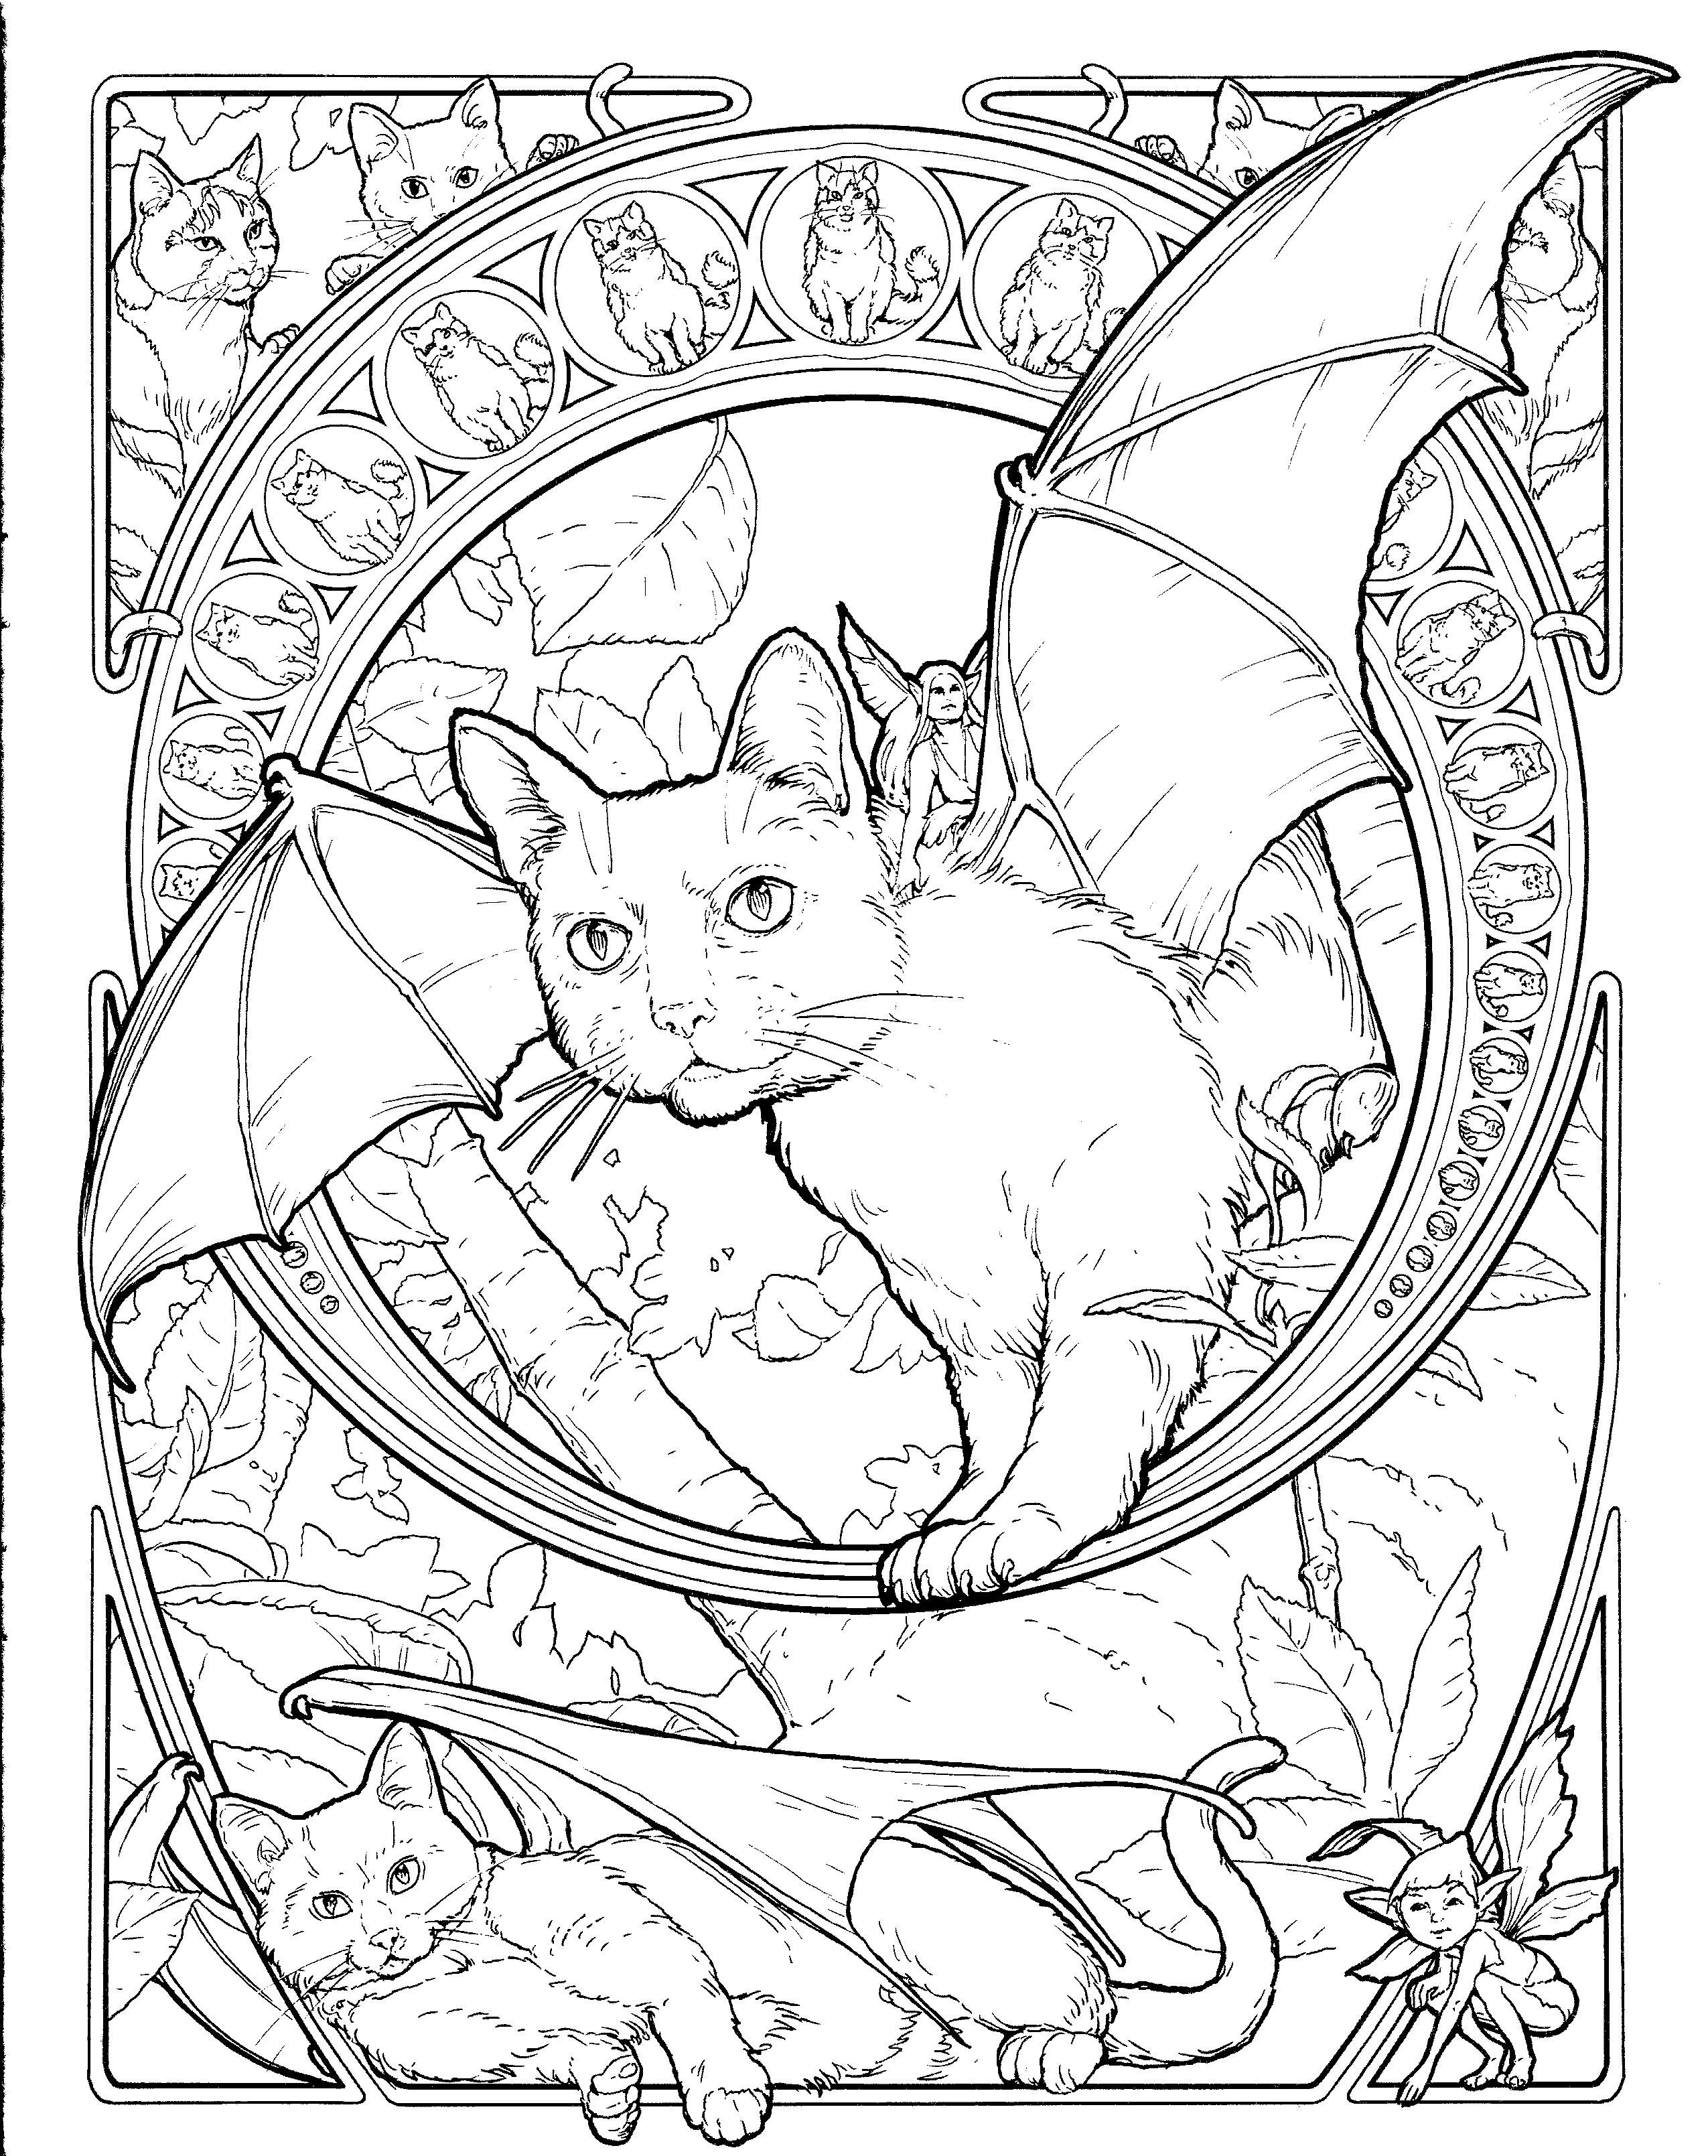 Pin By Theresa Smart On Art I Like Cat Coloring Page Fairy Coloring Pages Animal Coloring Pages